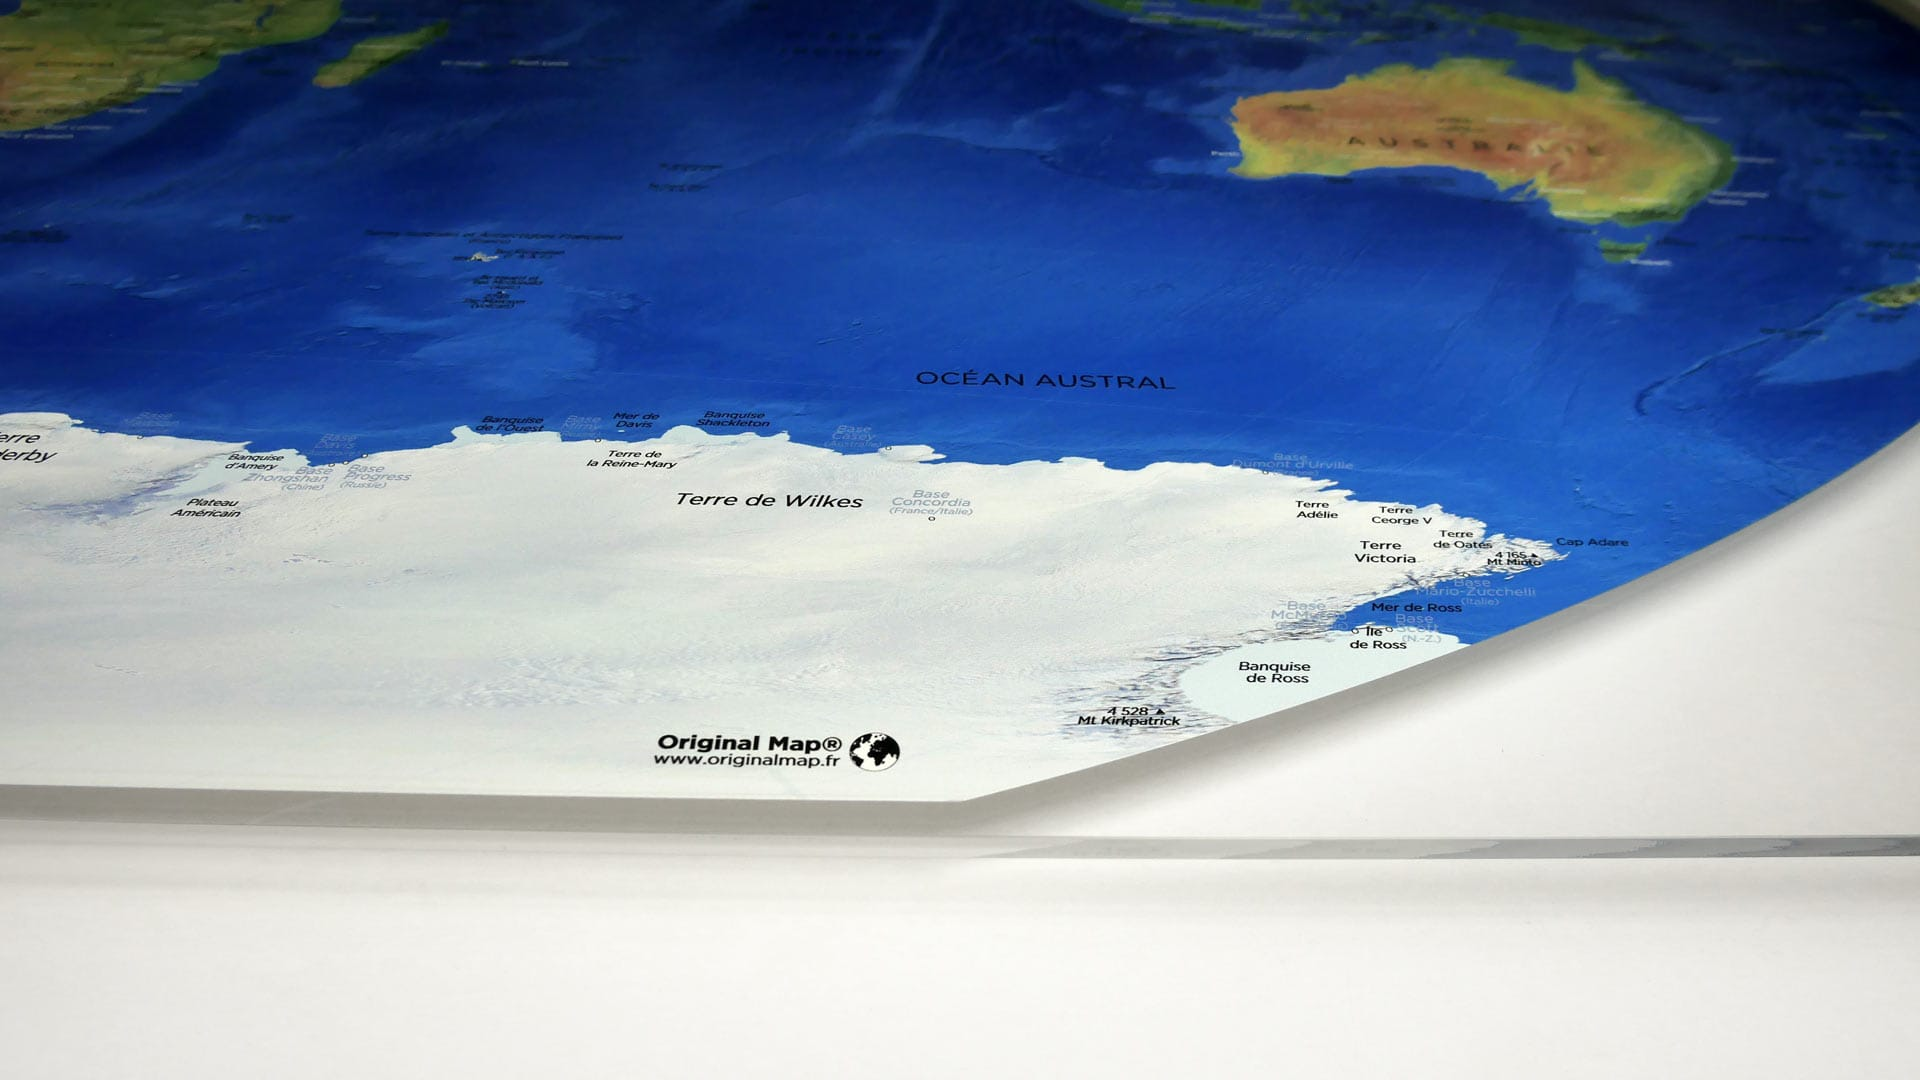 ORIGINAL MAP® - LE PLEXIGLAS® TRANSPARENT